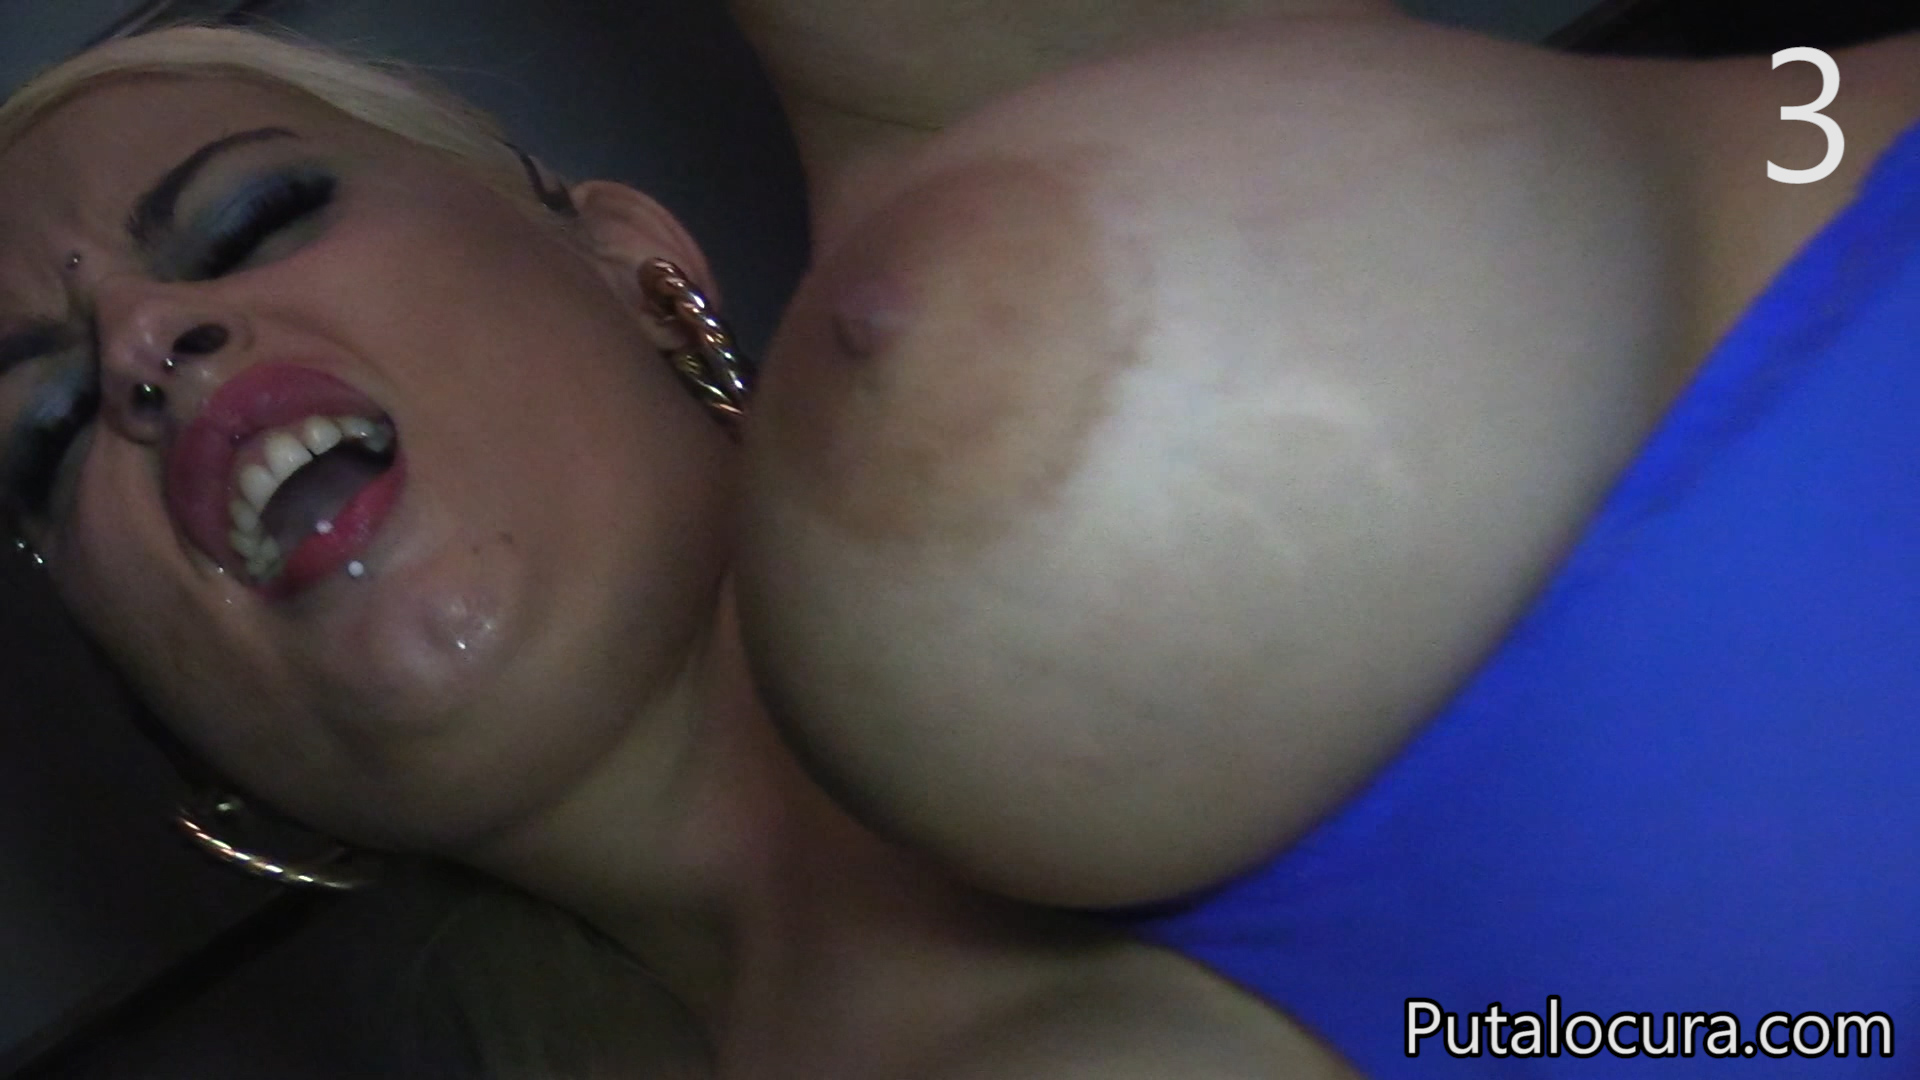 Candela X Escort glory hole | putalocura